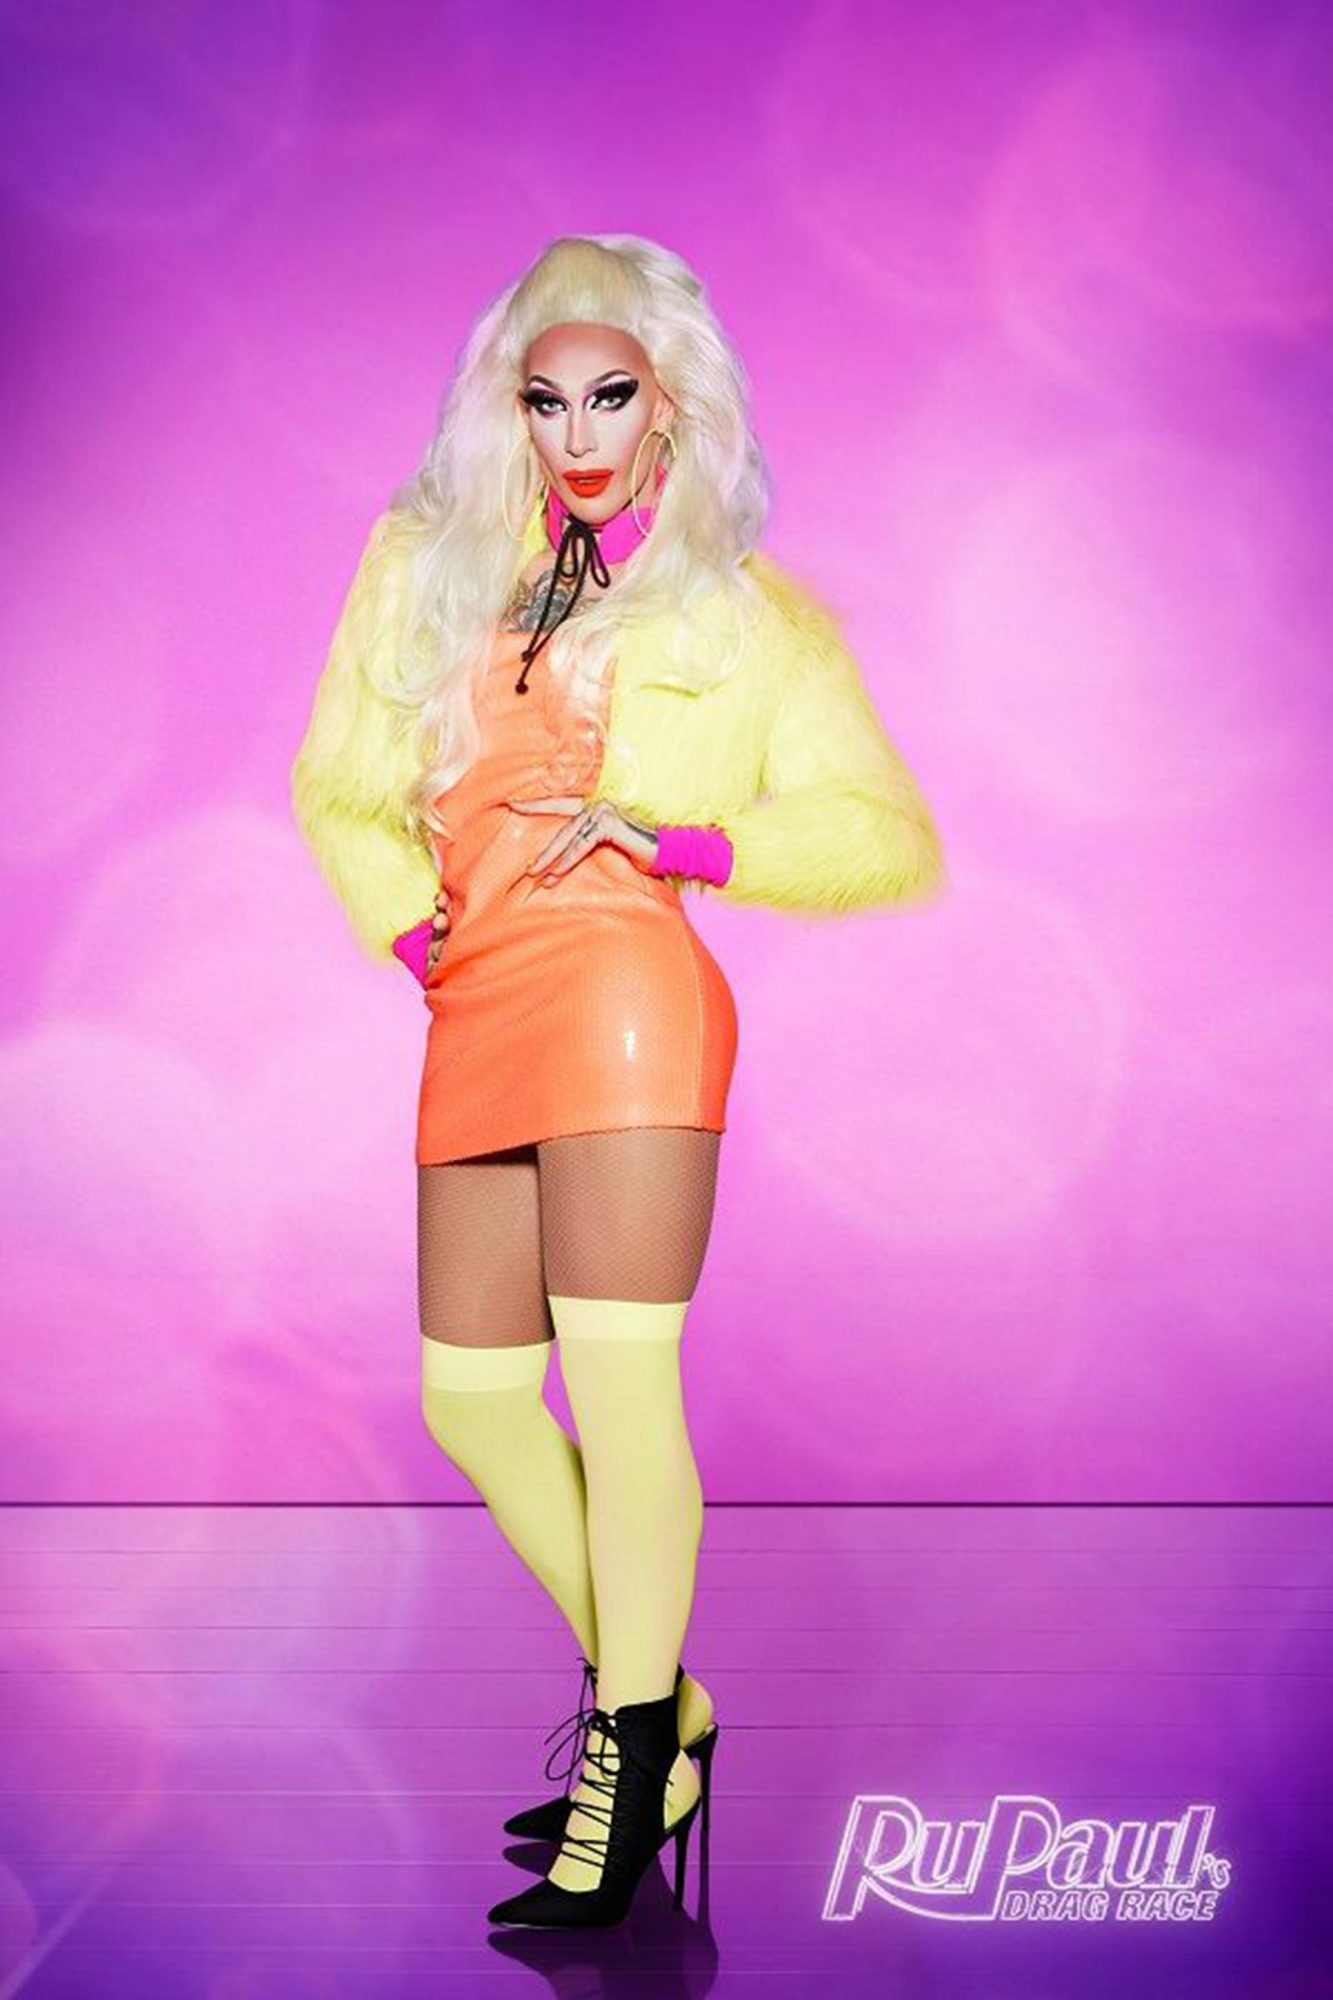 RuPaul Drag Race -- Pictured: KAMERON CR: VH1